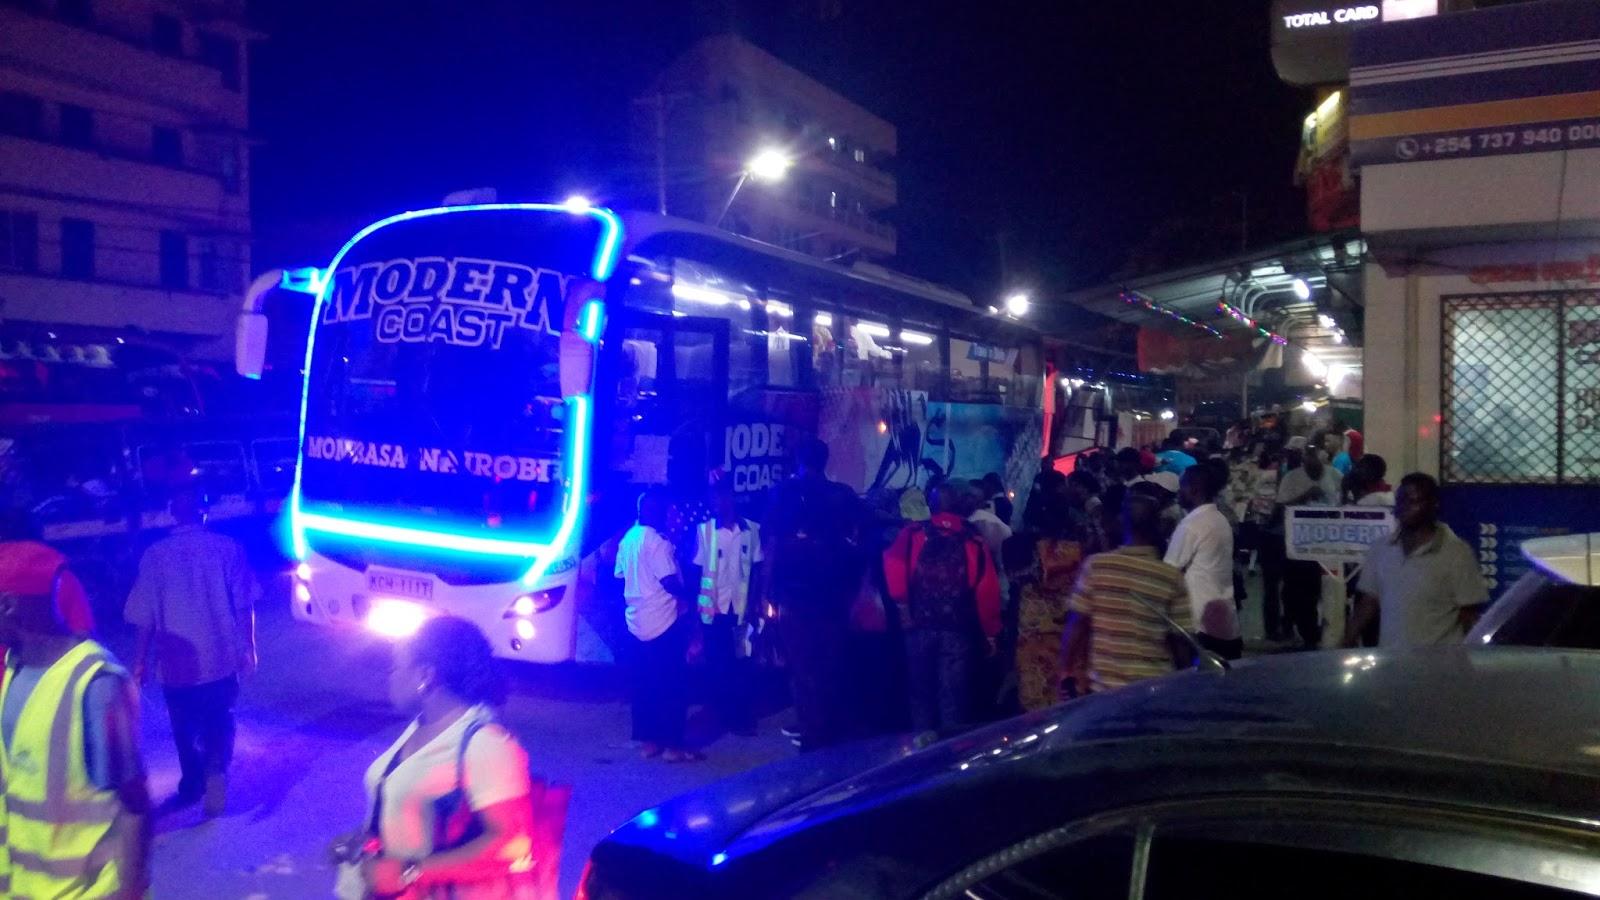 Matatus Appeal for Suspension of Night Travel Ban